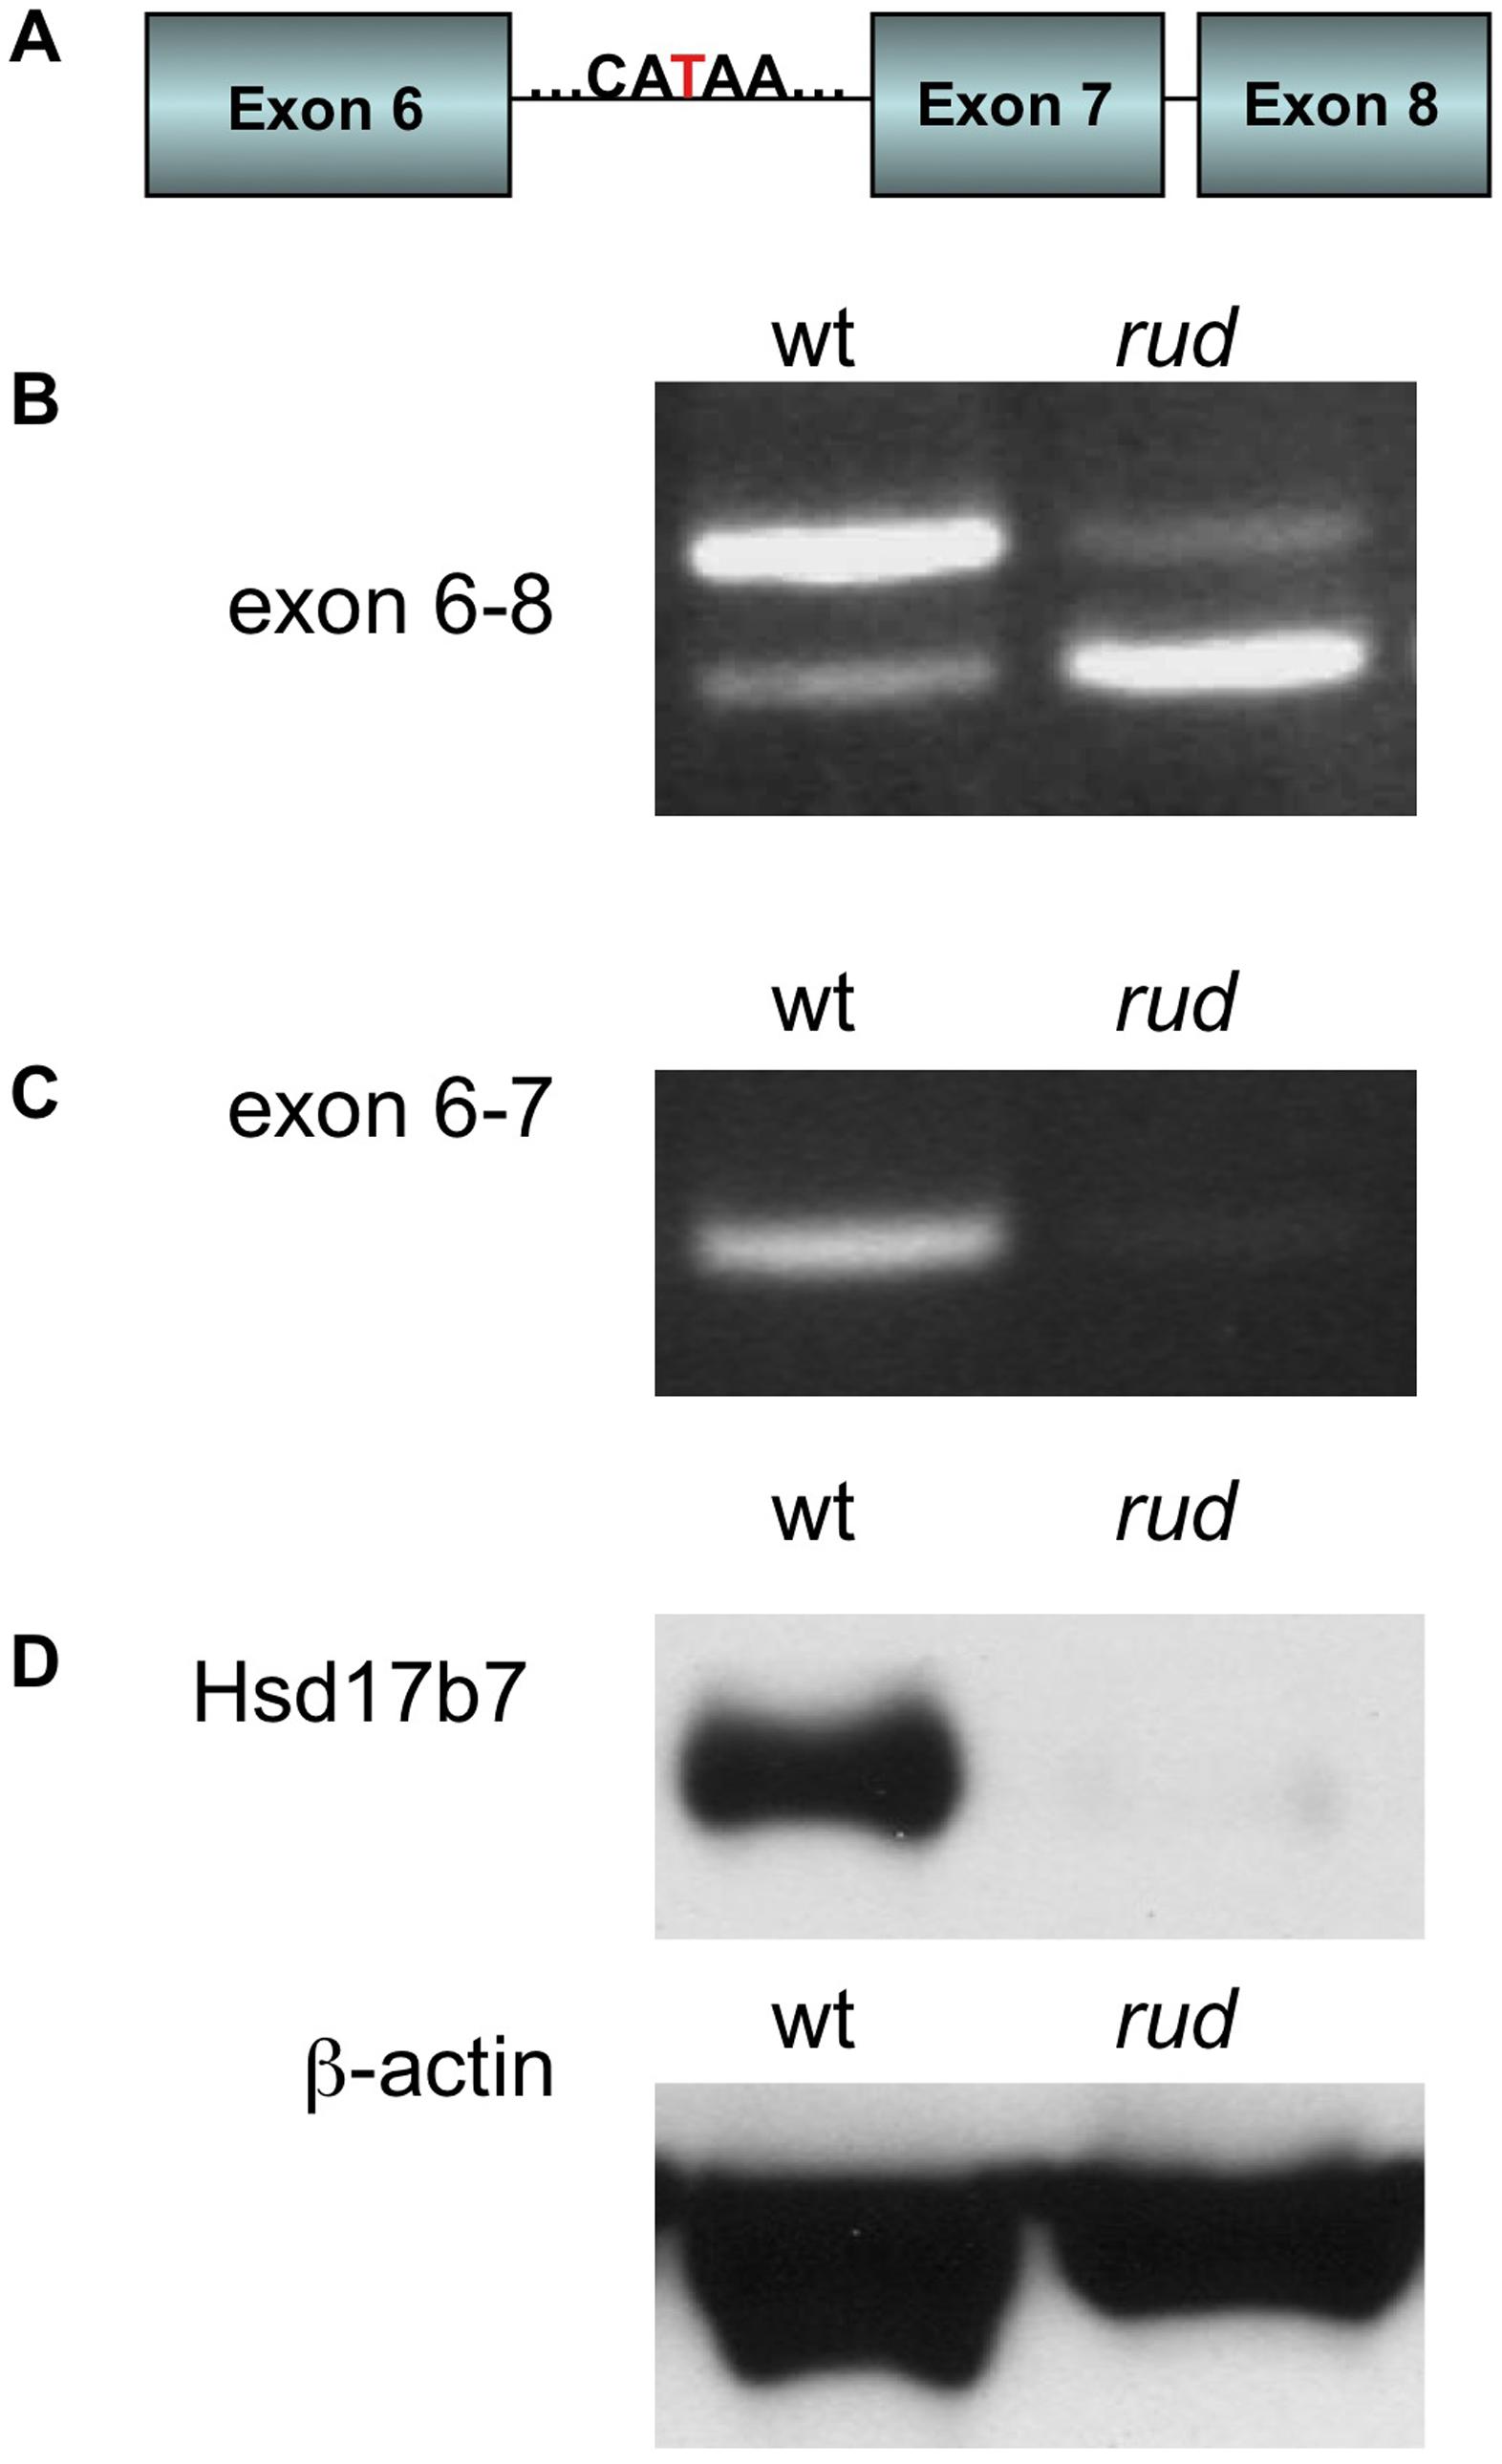 <i>Hsd17b7</i> is the gene carrying the <i>rudolph</i> mutation.